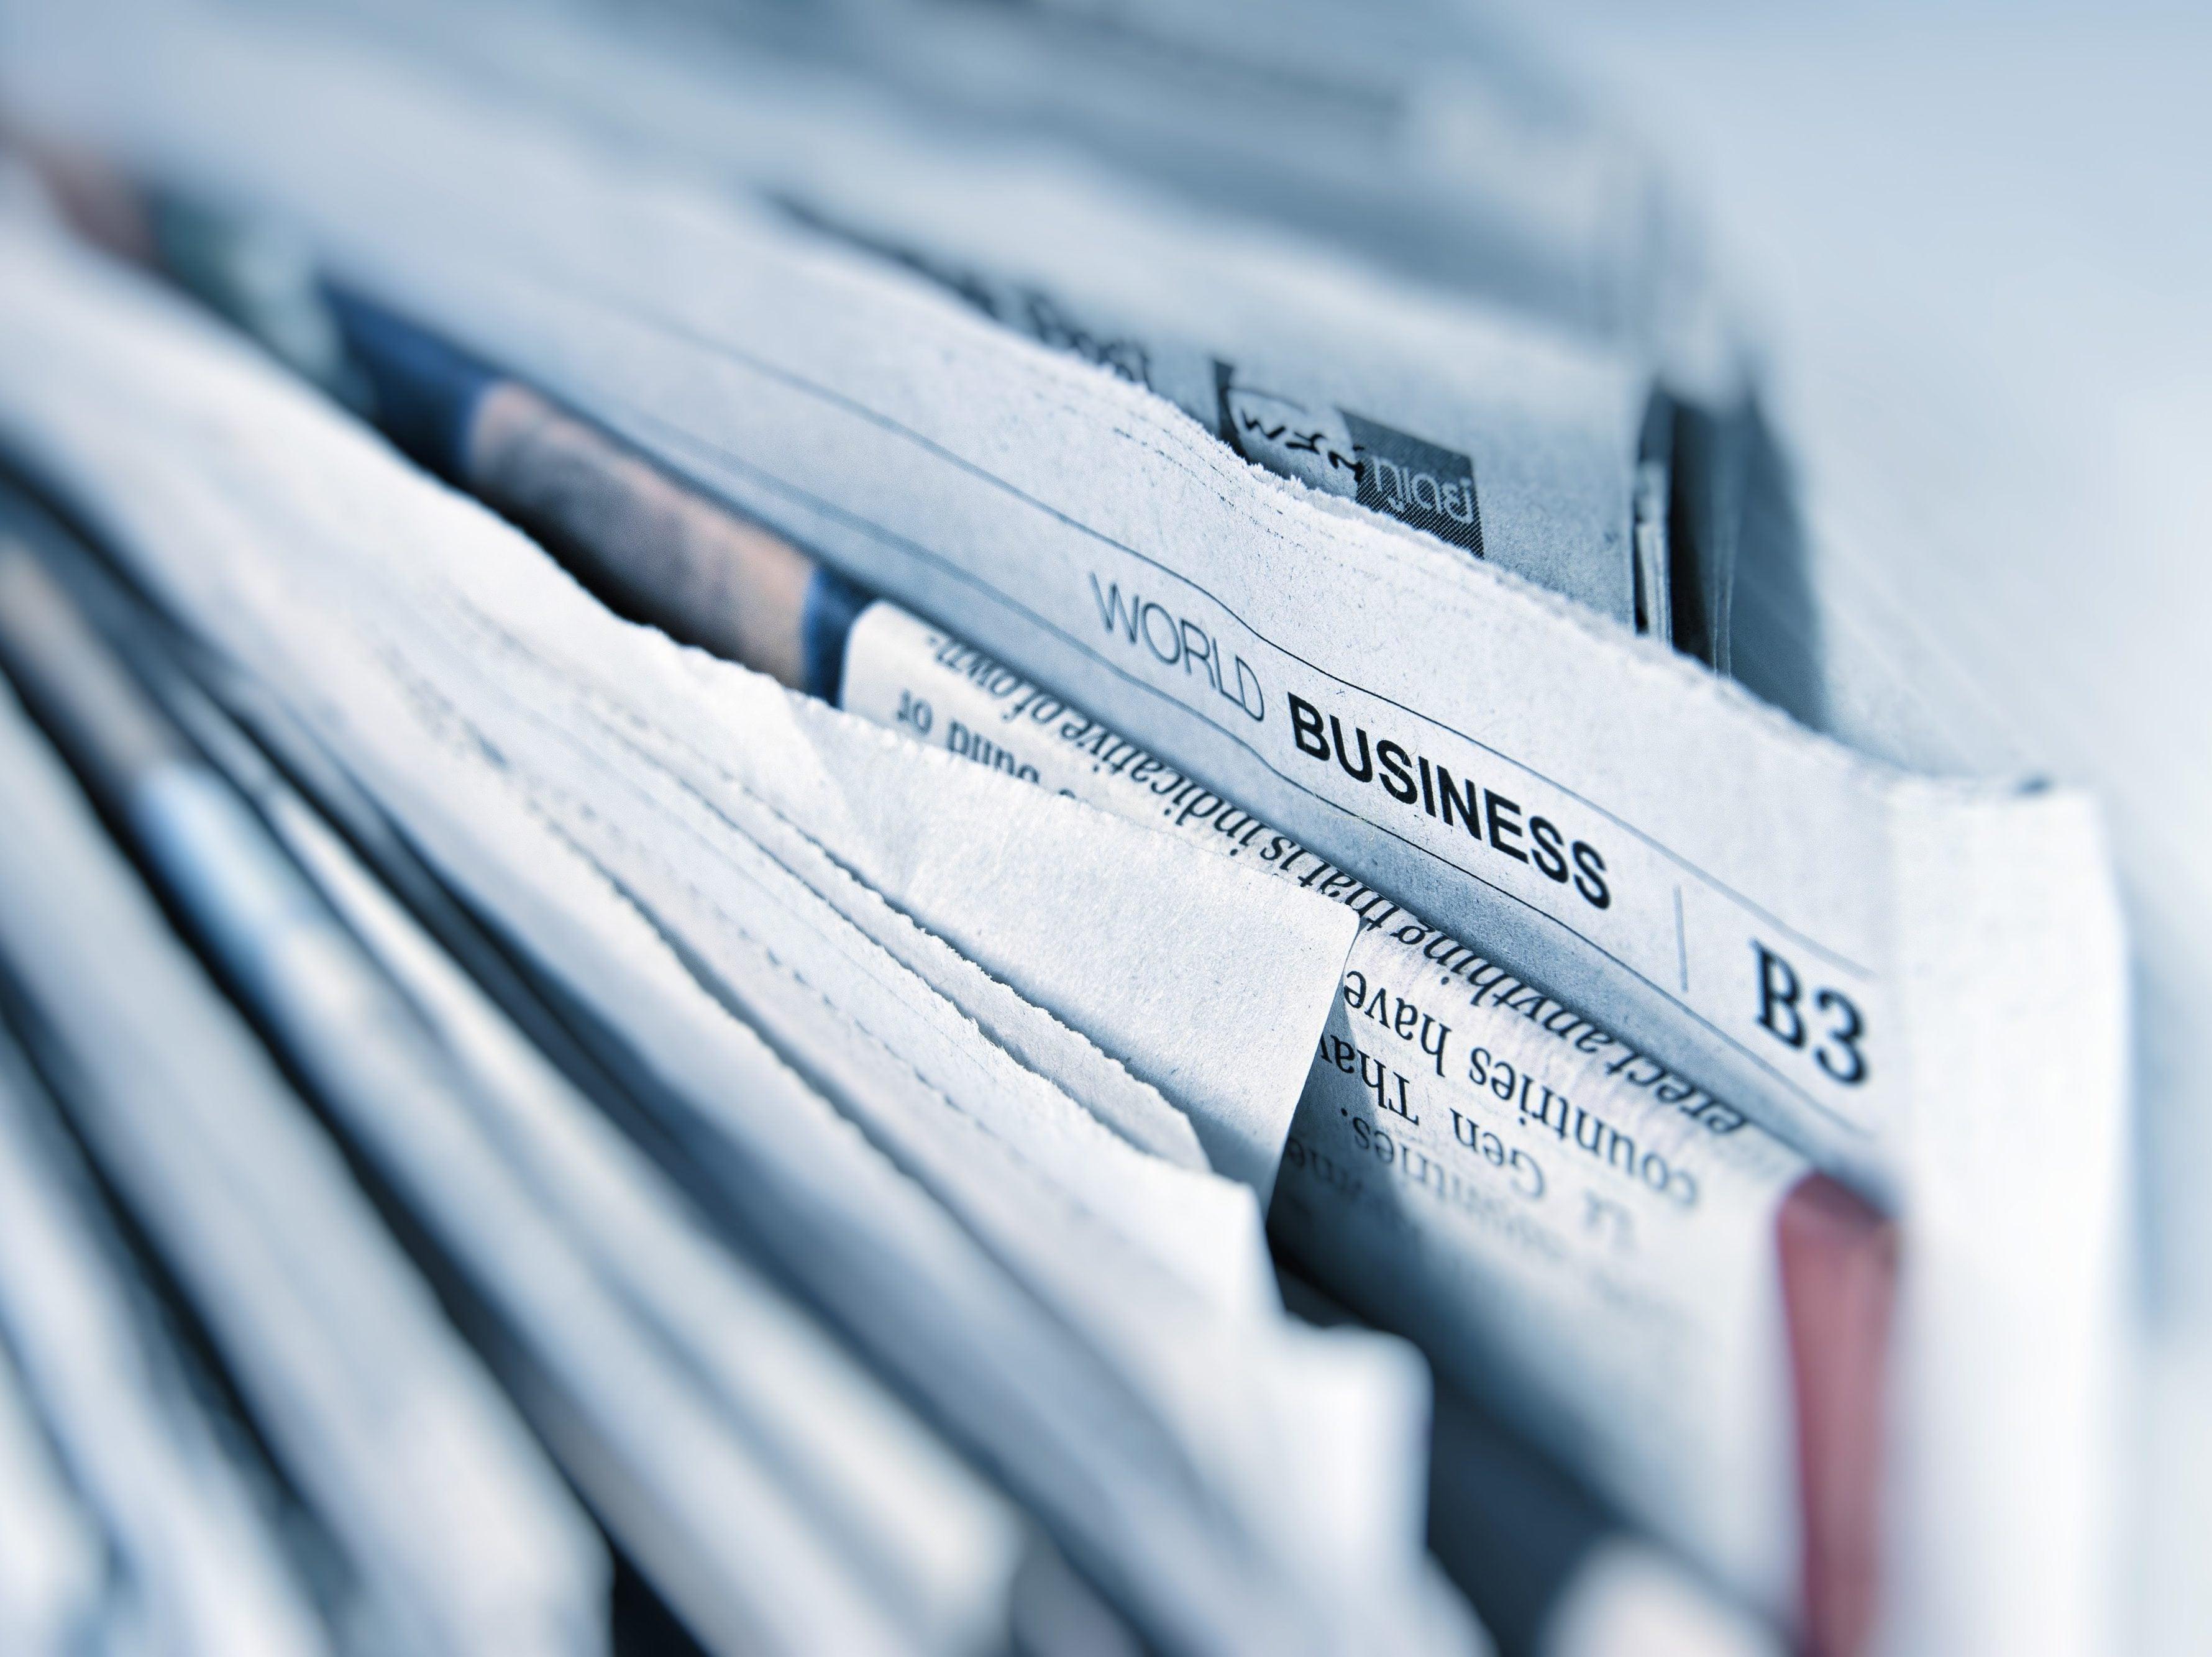 Shelf of newspapers